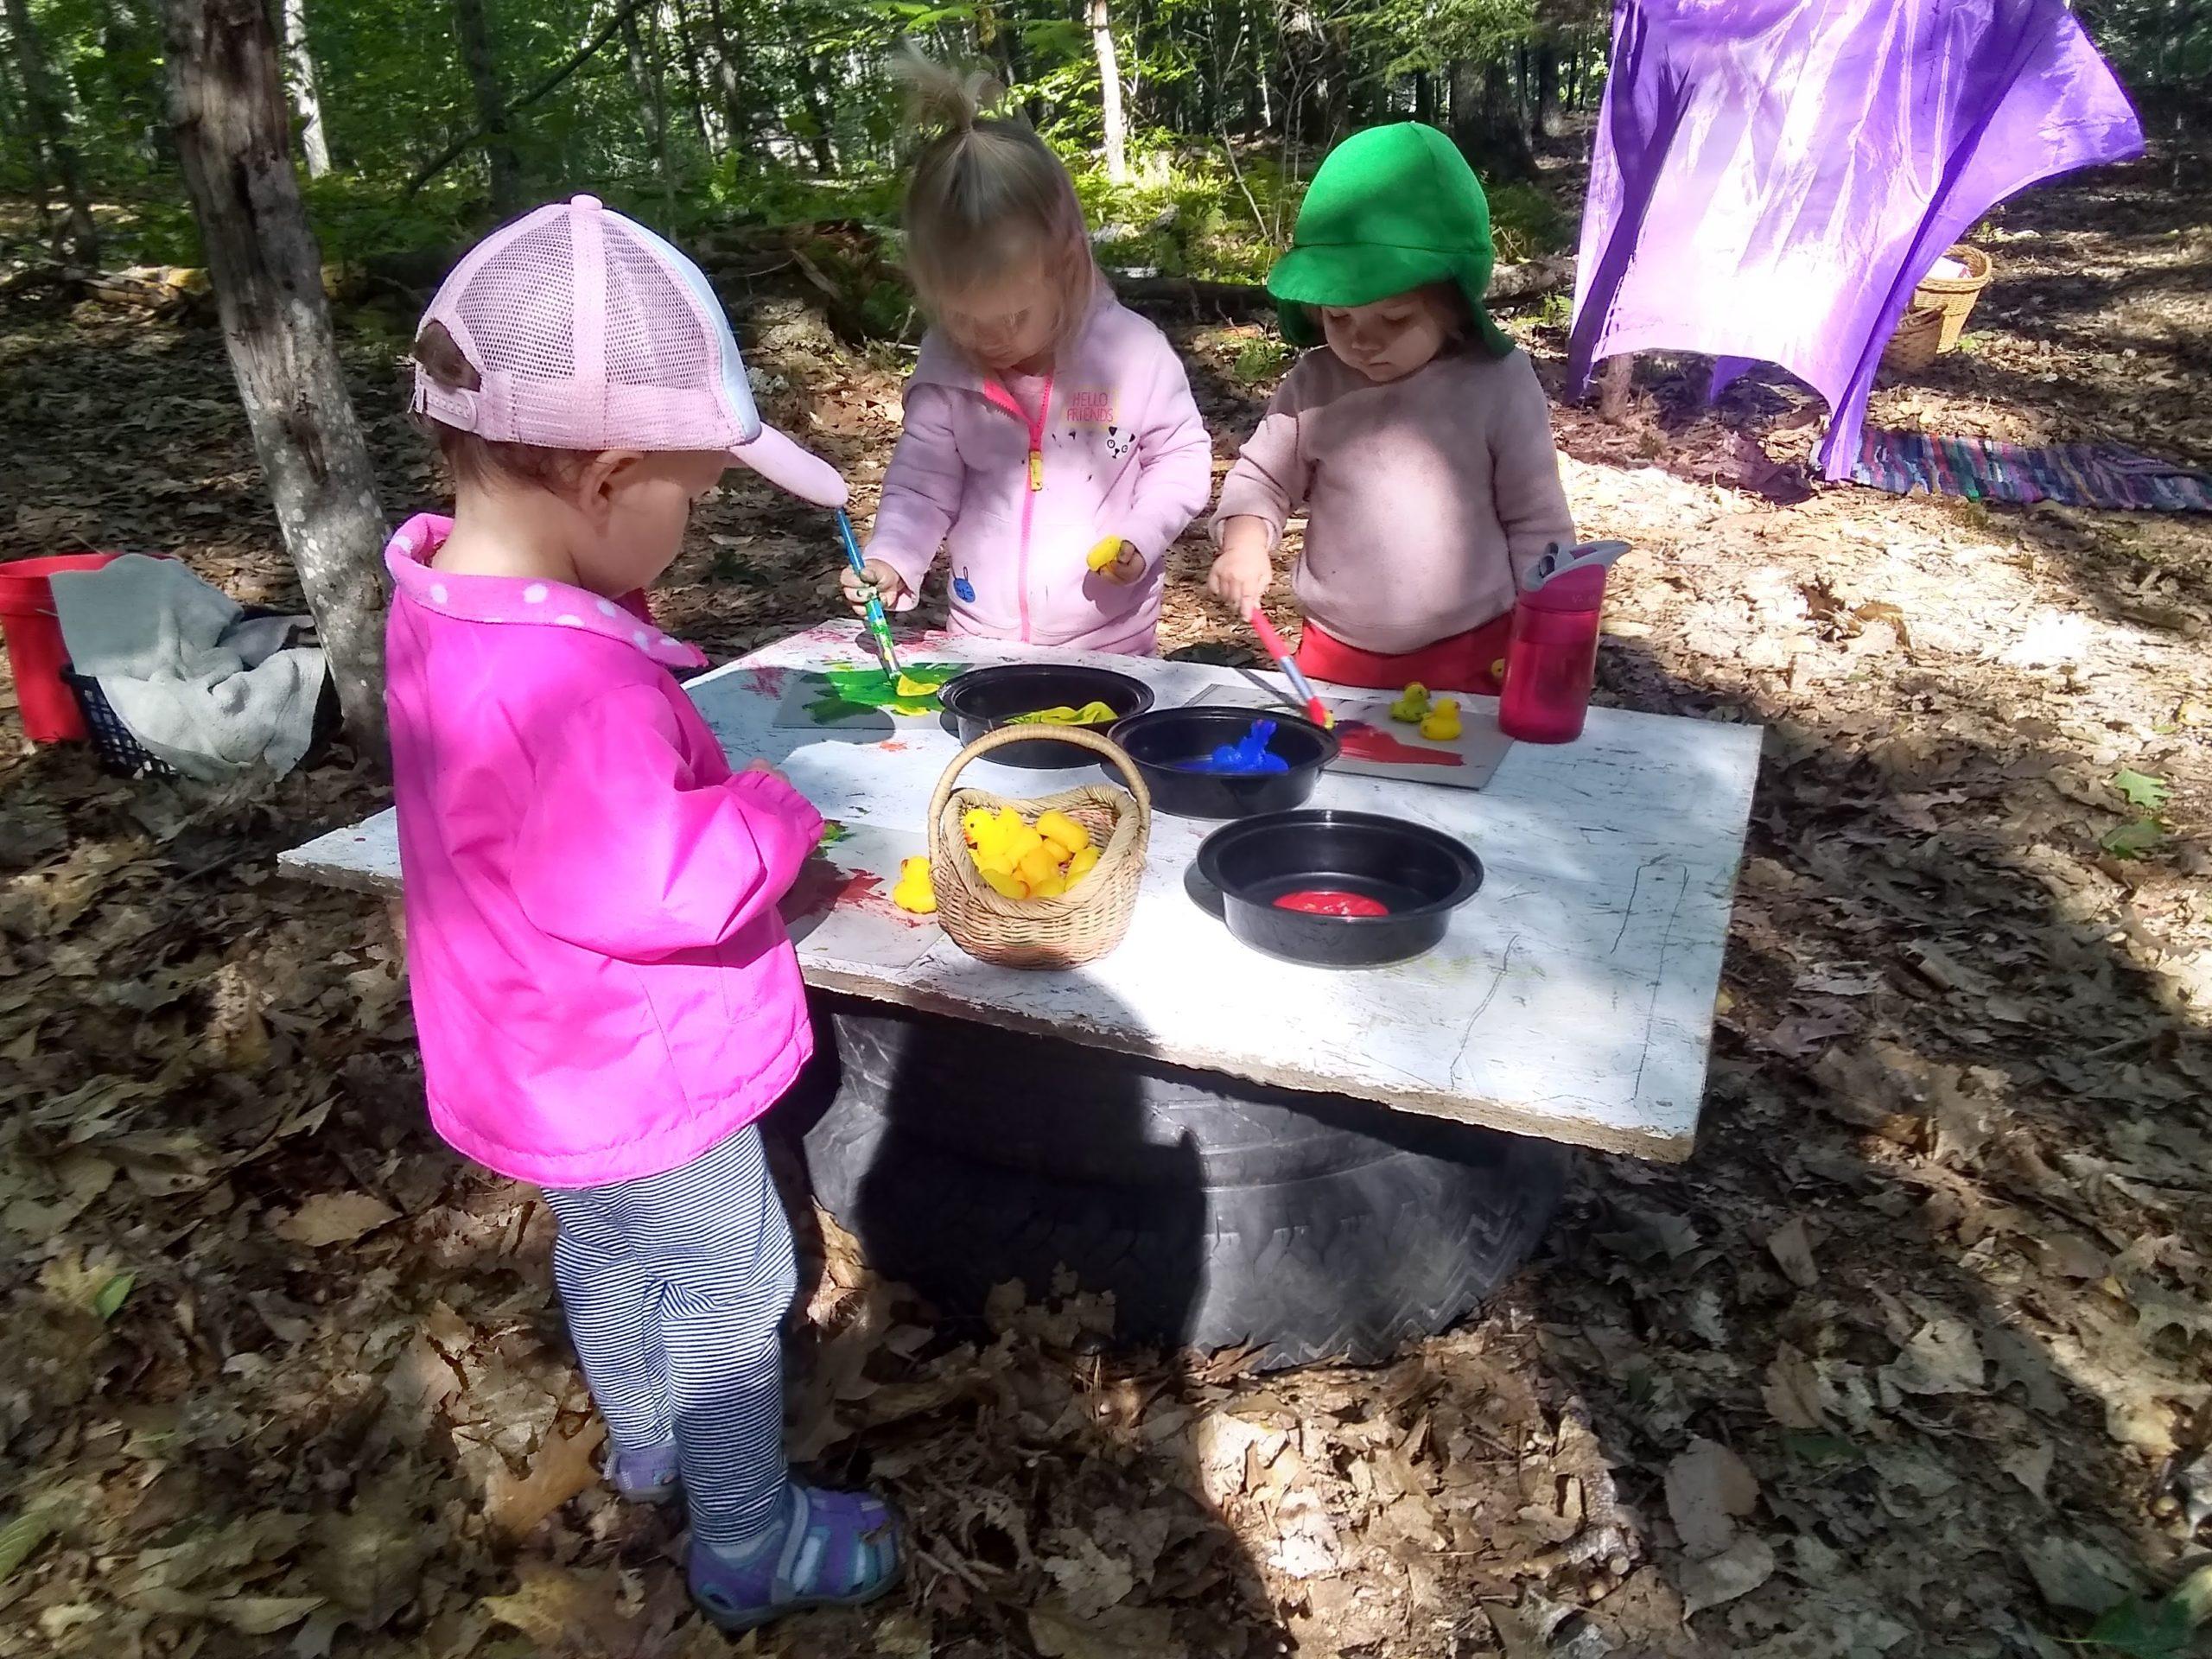 Tiny Ones Spring Thursdays - TimberNook of Greater Portland, Maine